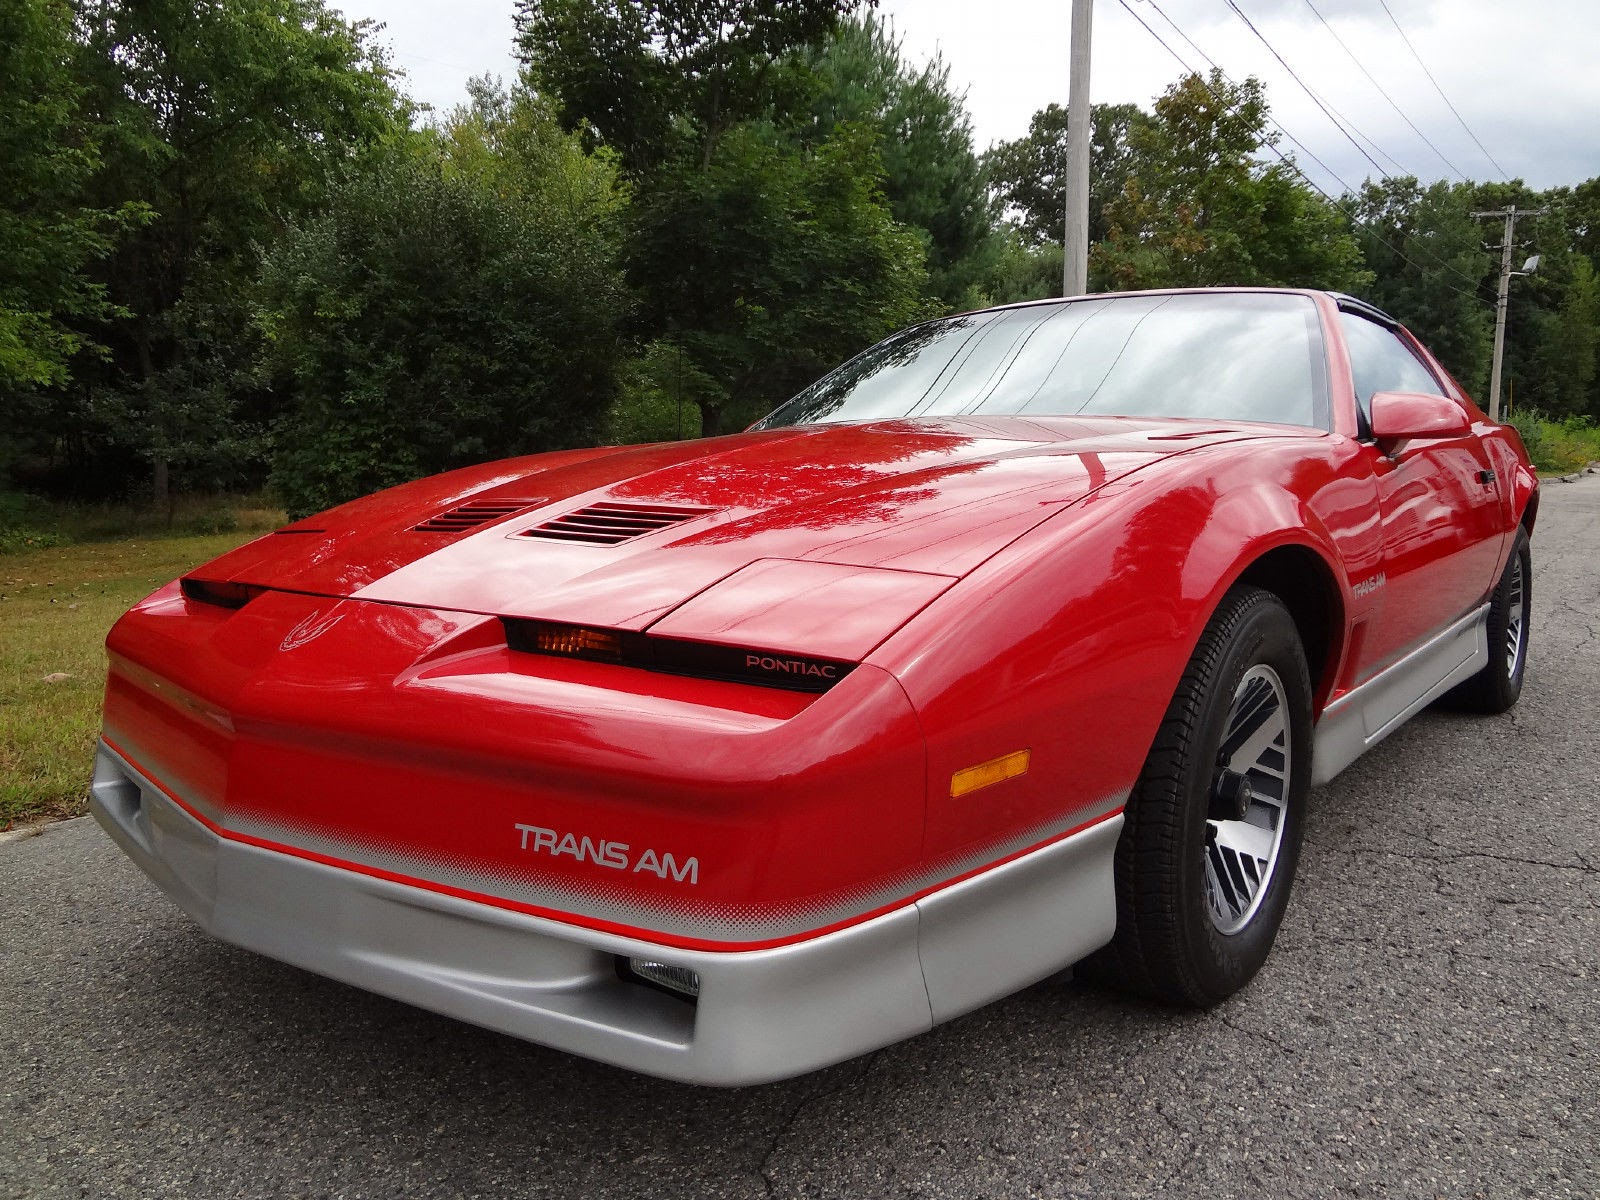 All American Classic Cars 1985 Pontiac Firebird Trans Am